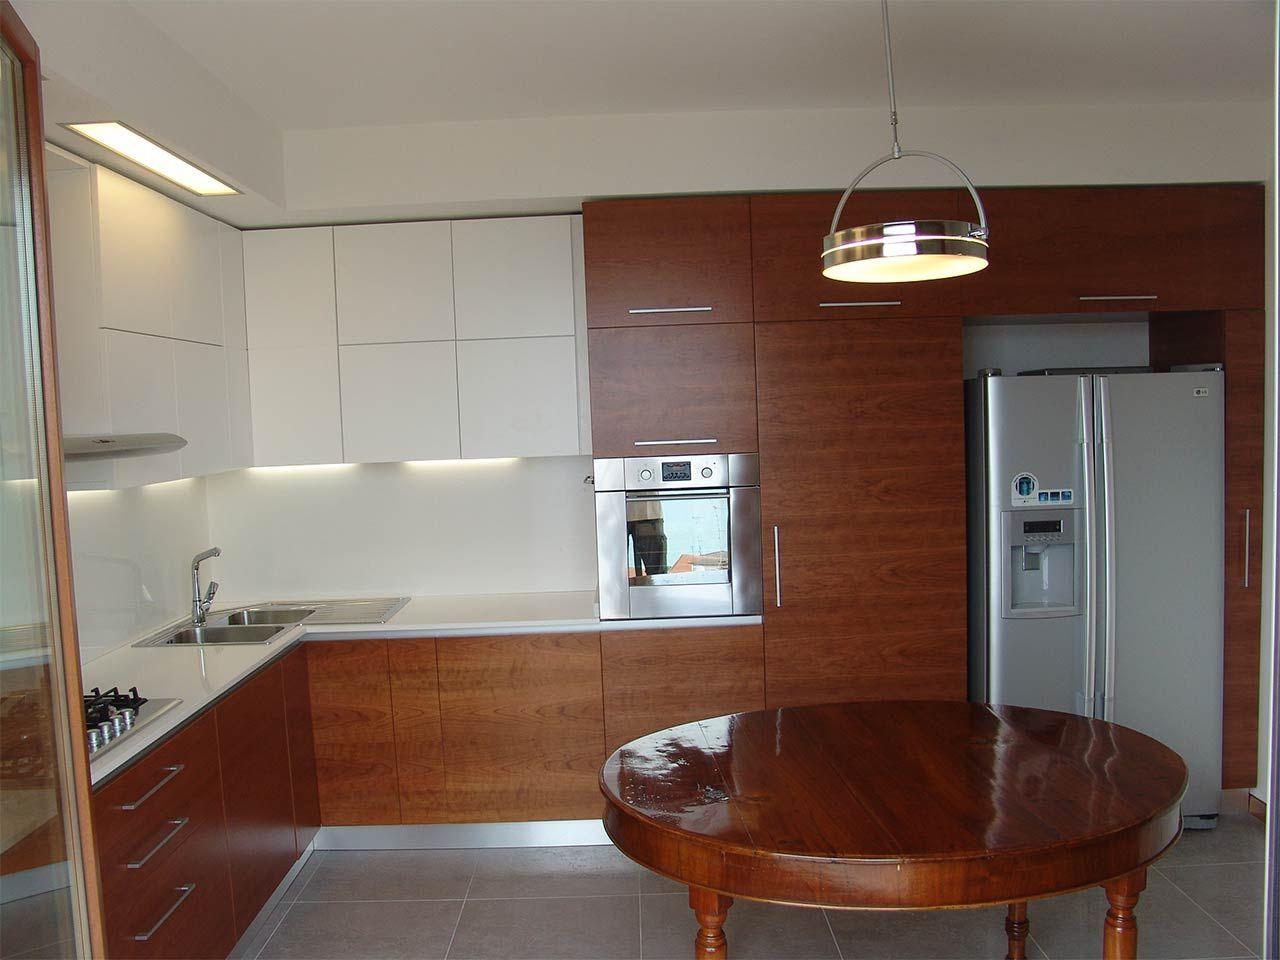 Cucina Moderna Ciliegio | Cucine Ciliegio Cucine Monoblocco Color ...